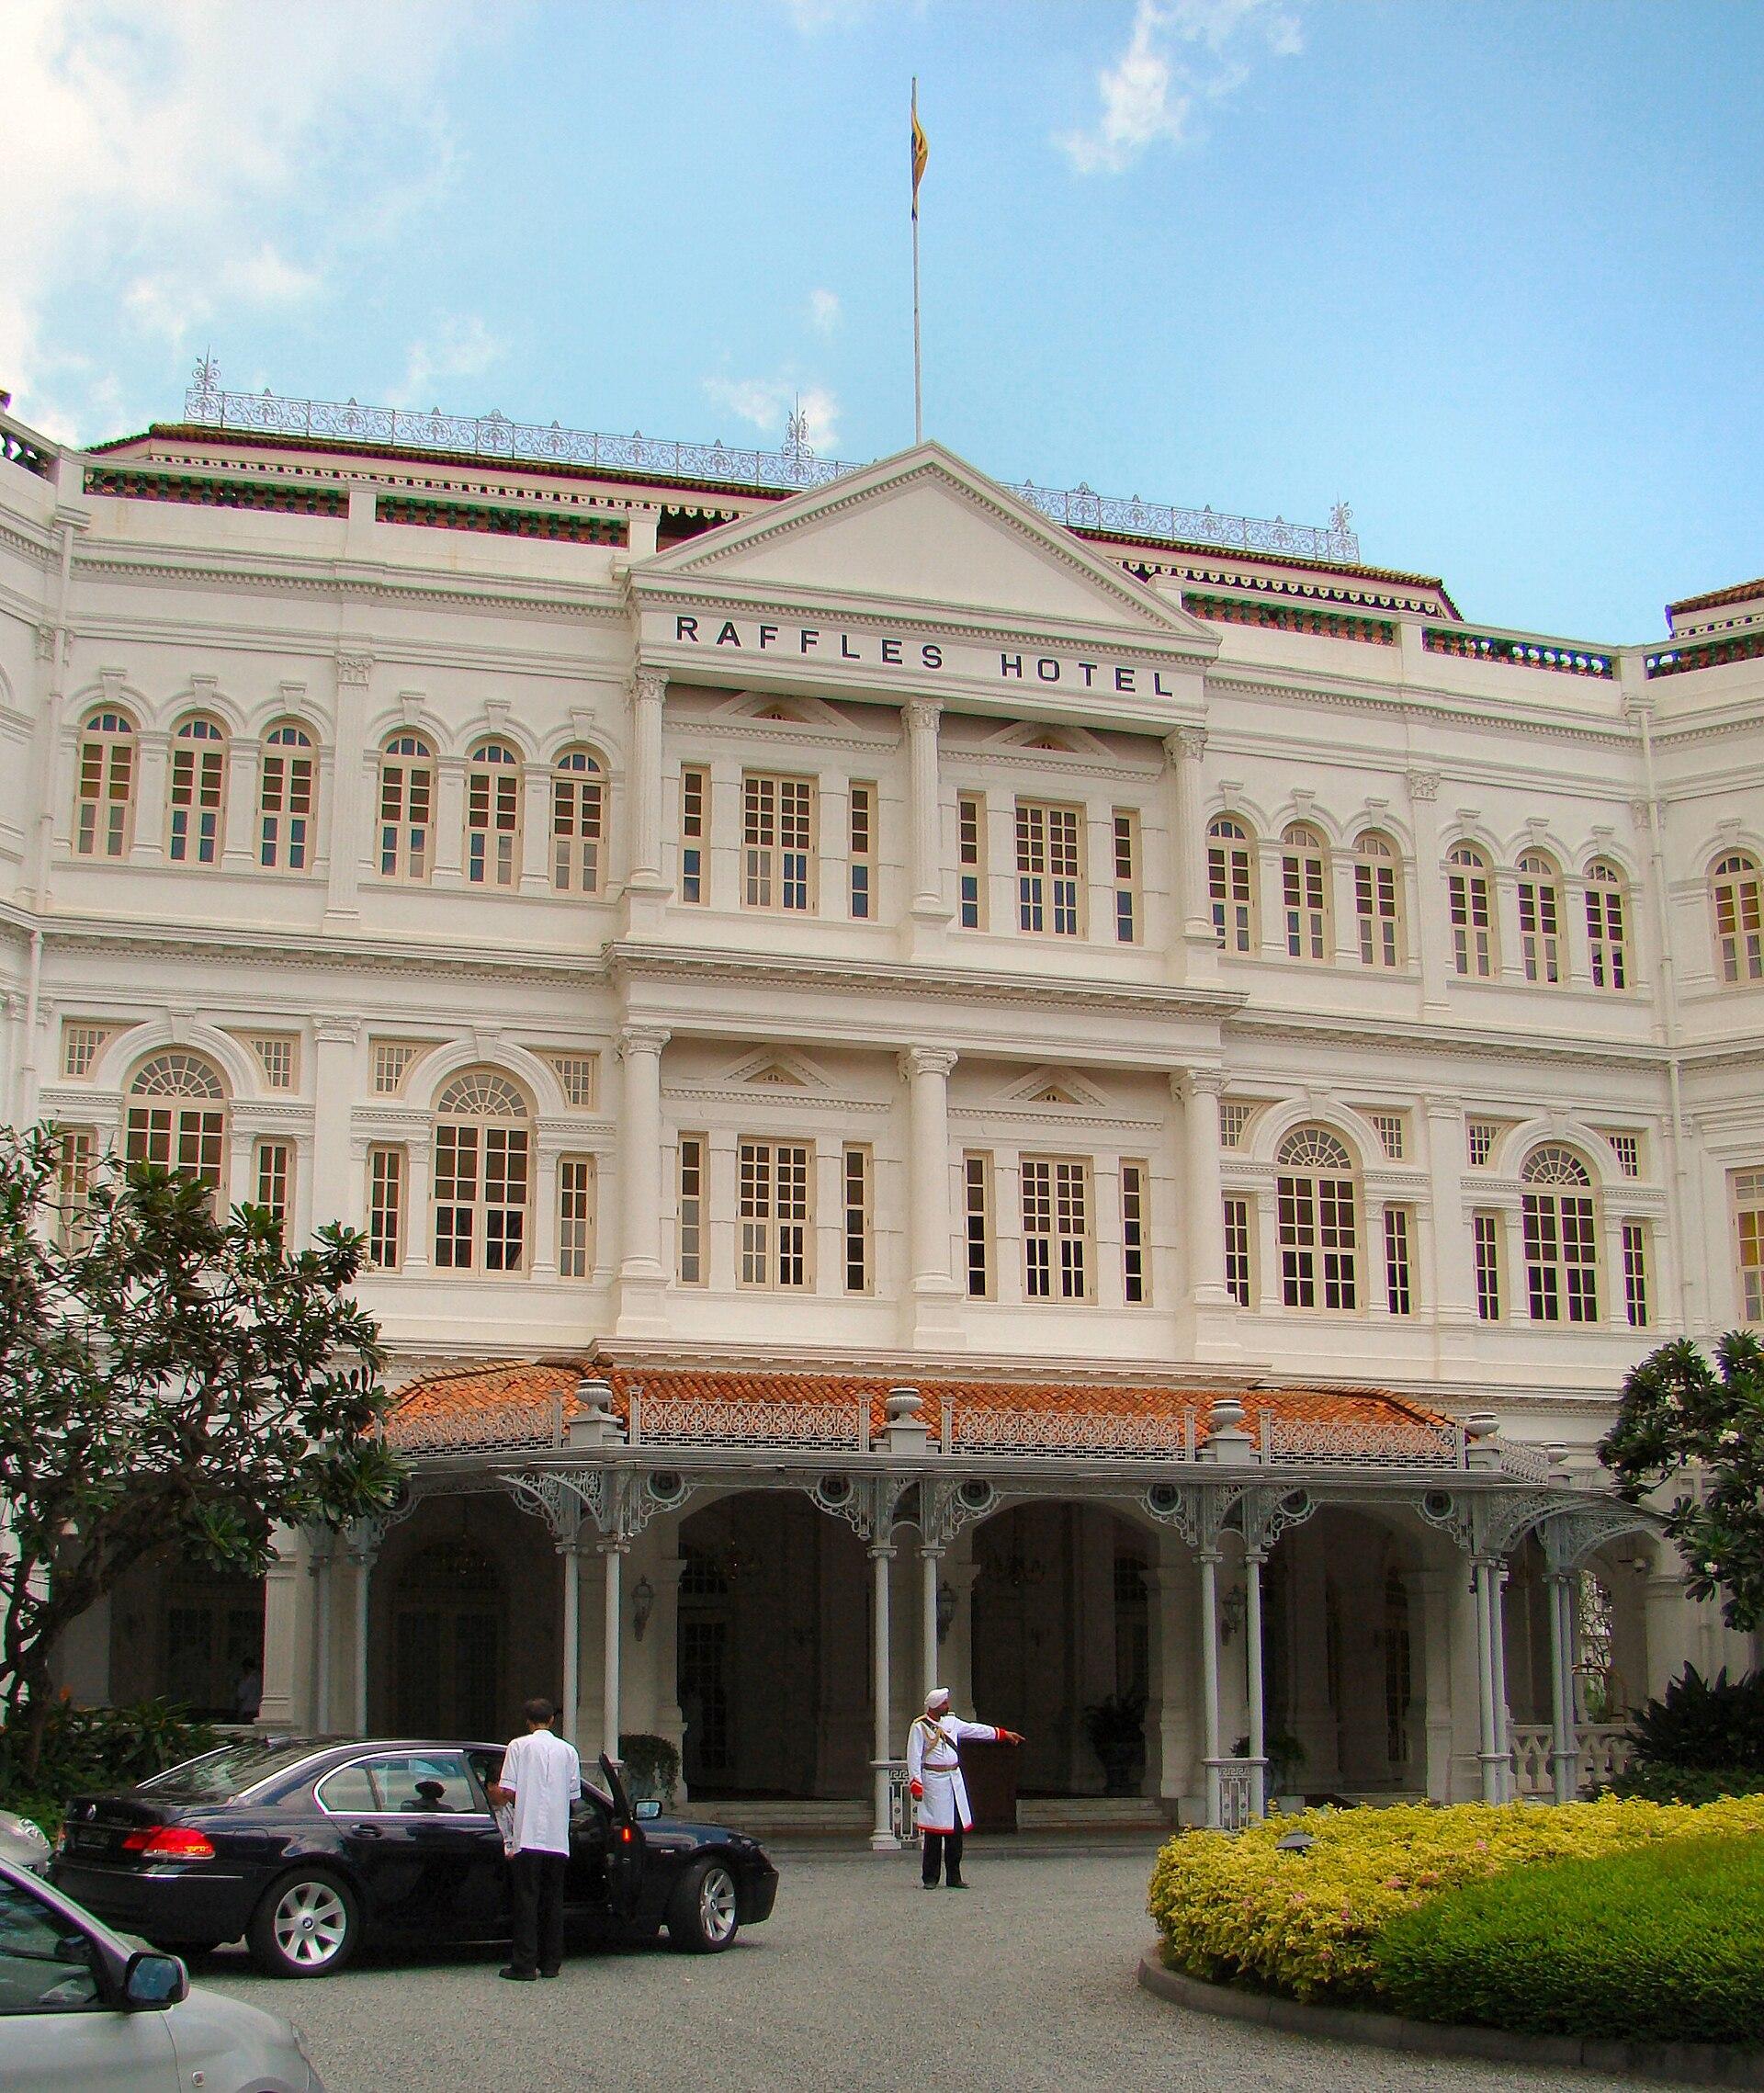 Raffles Hotel Wikipedia